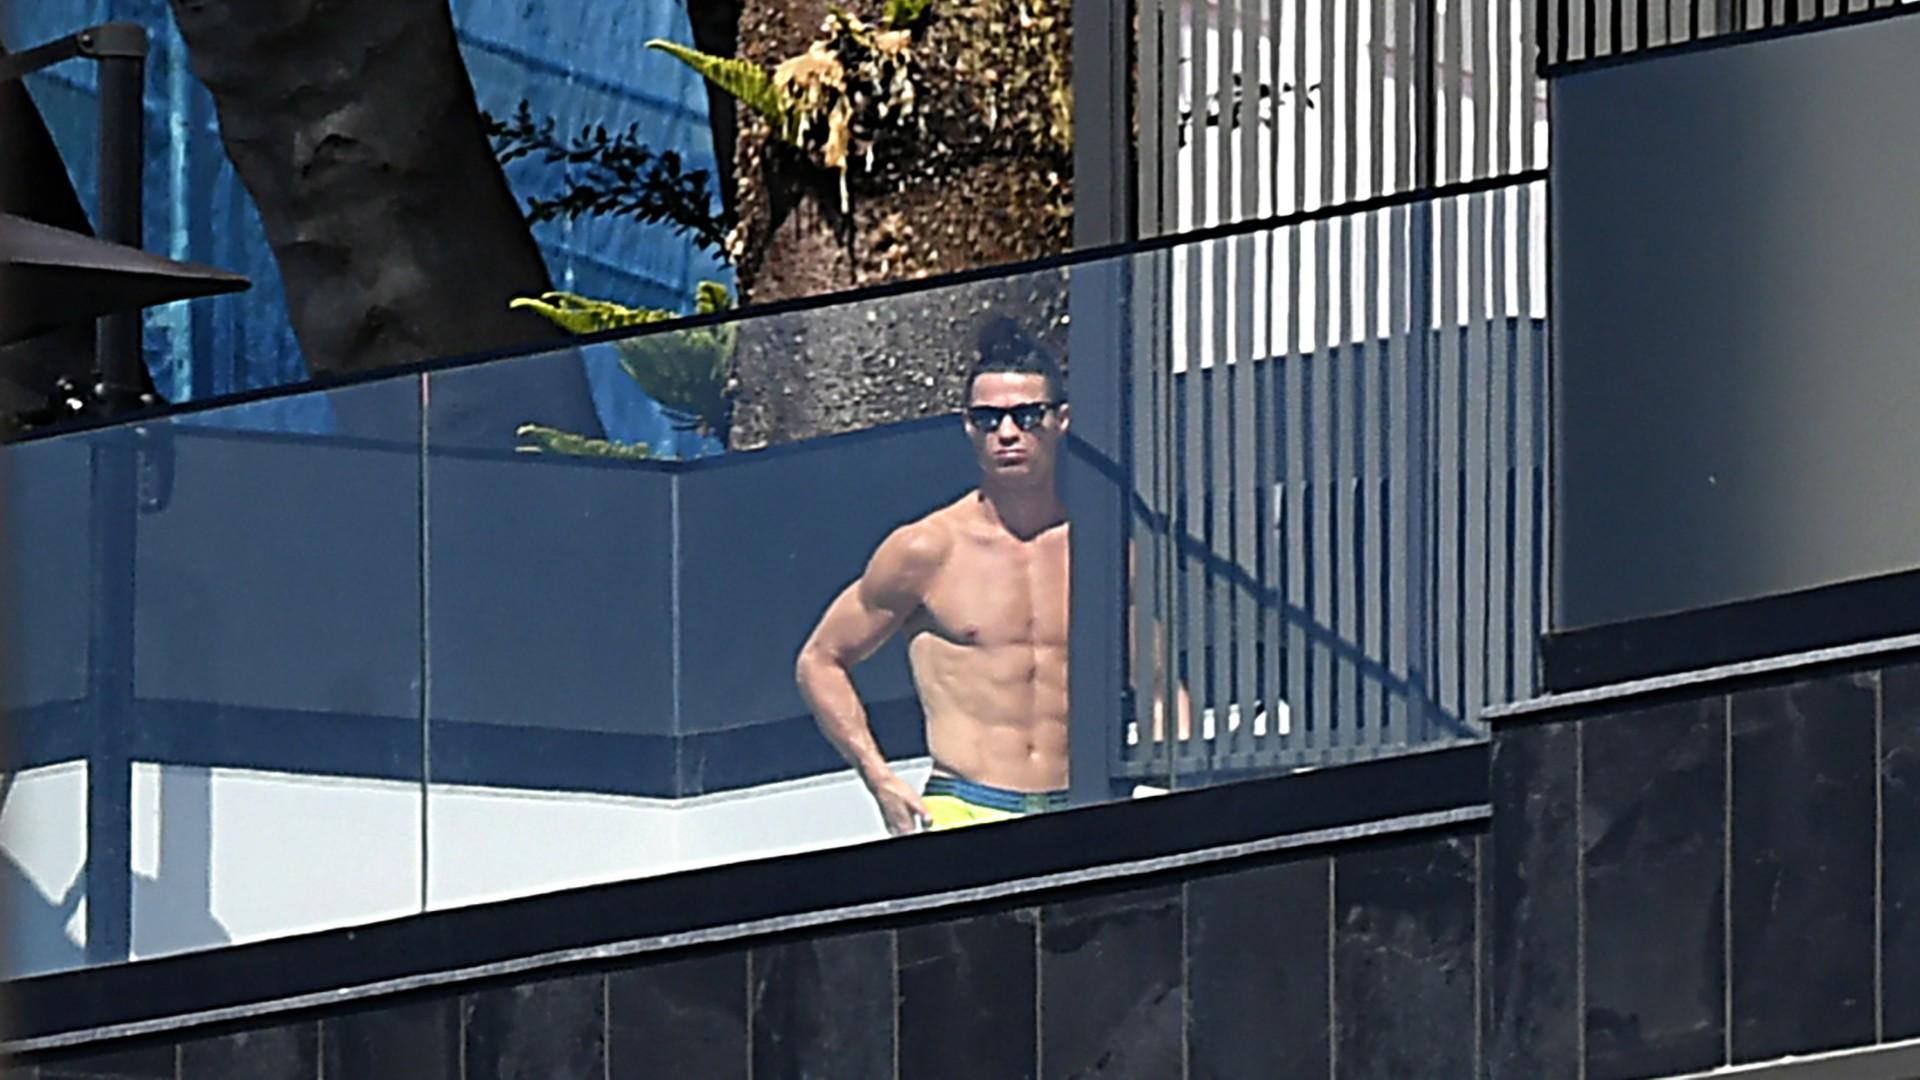 Crisitano Ronaldo Madeira